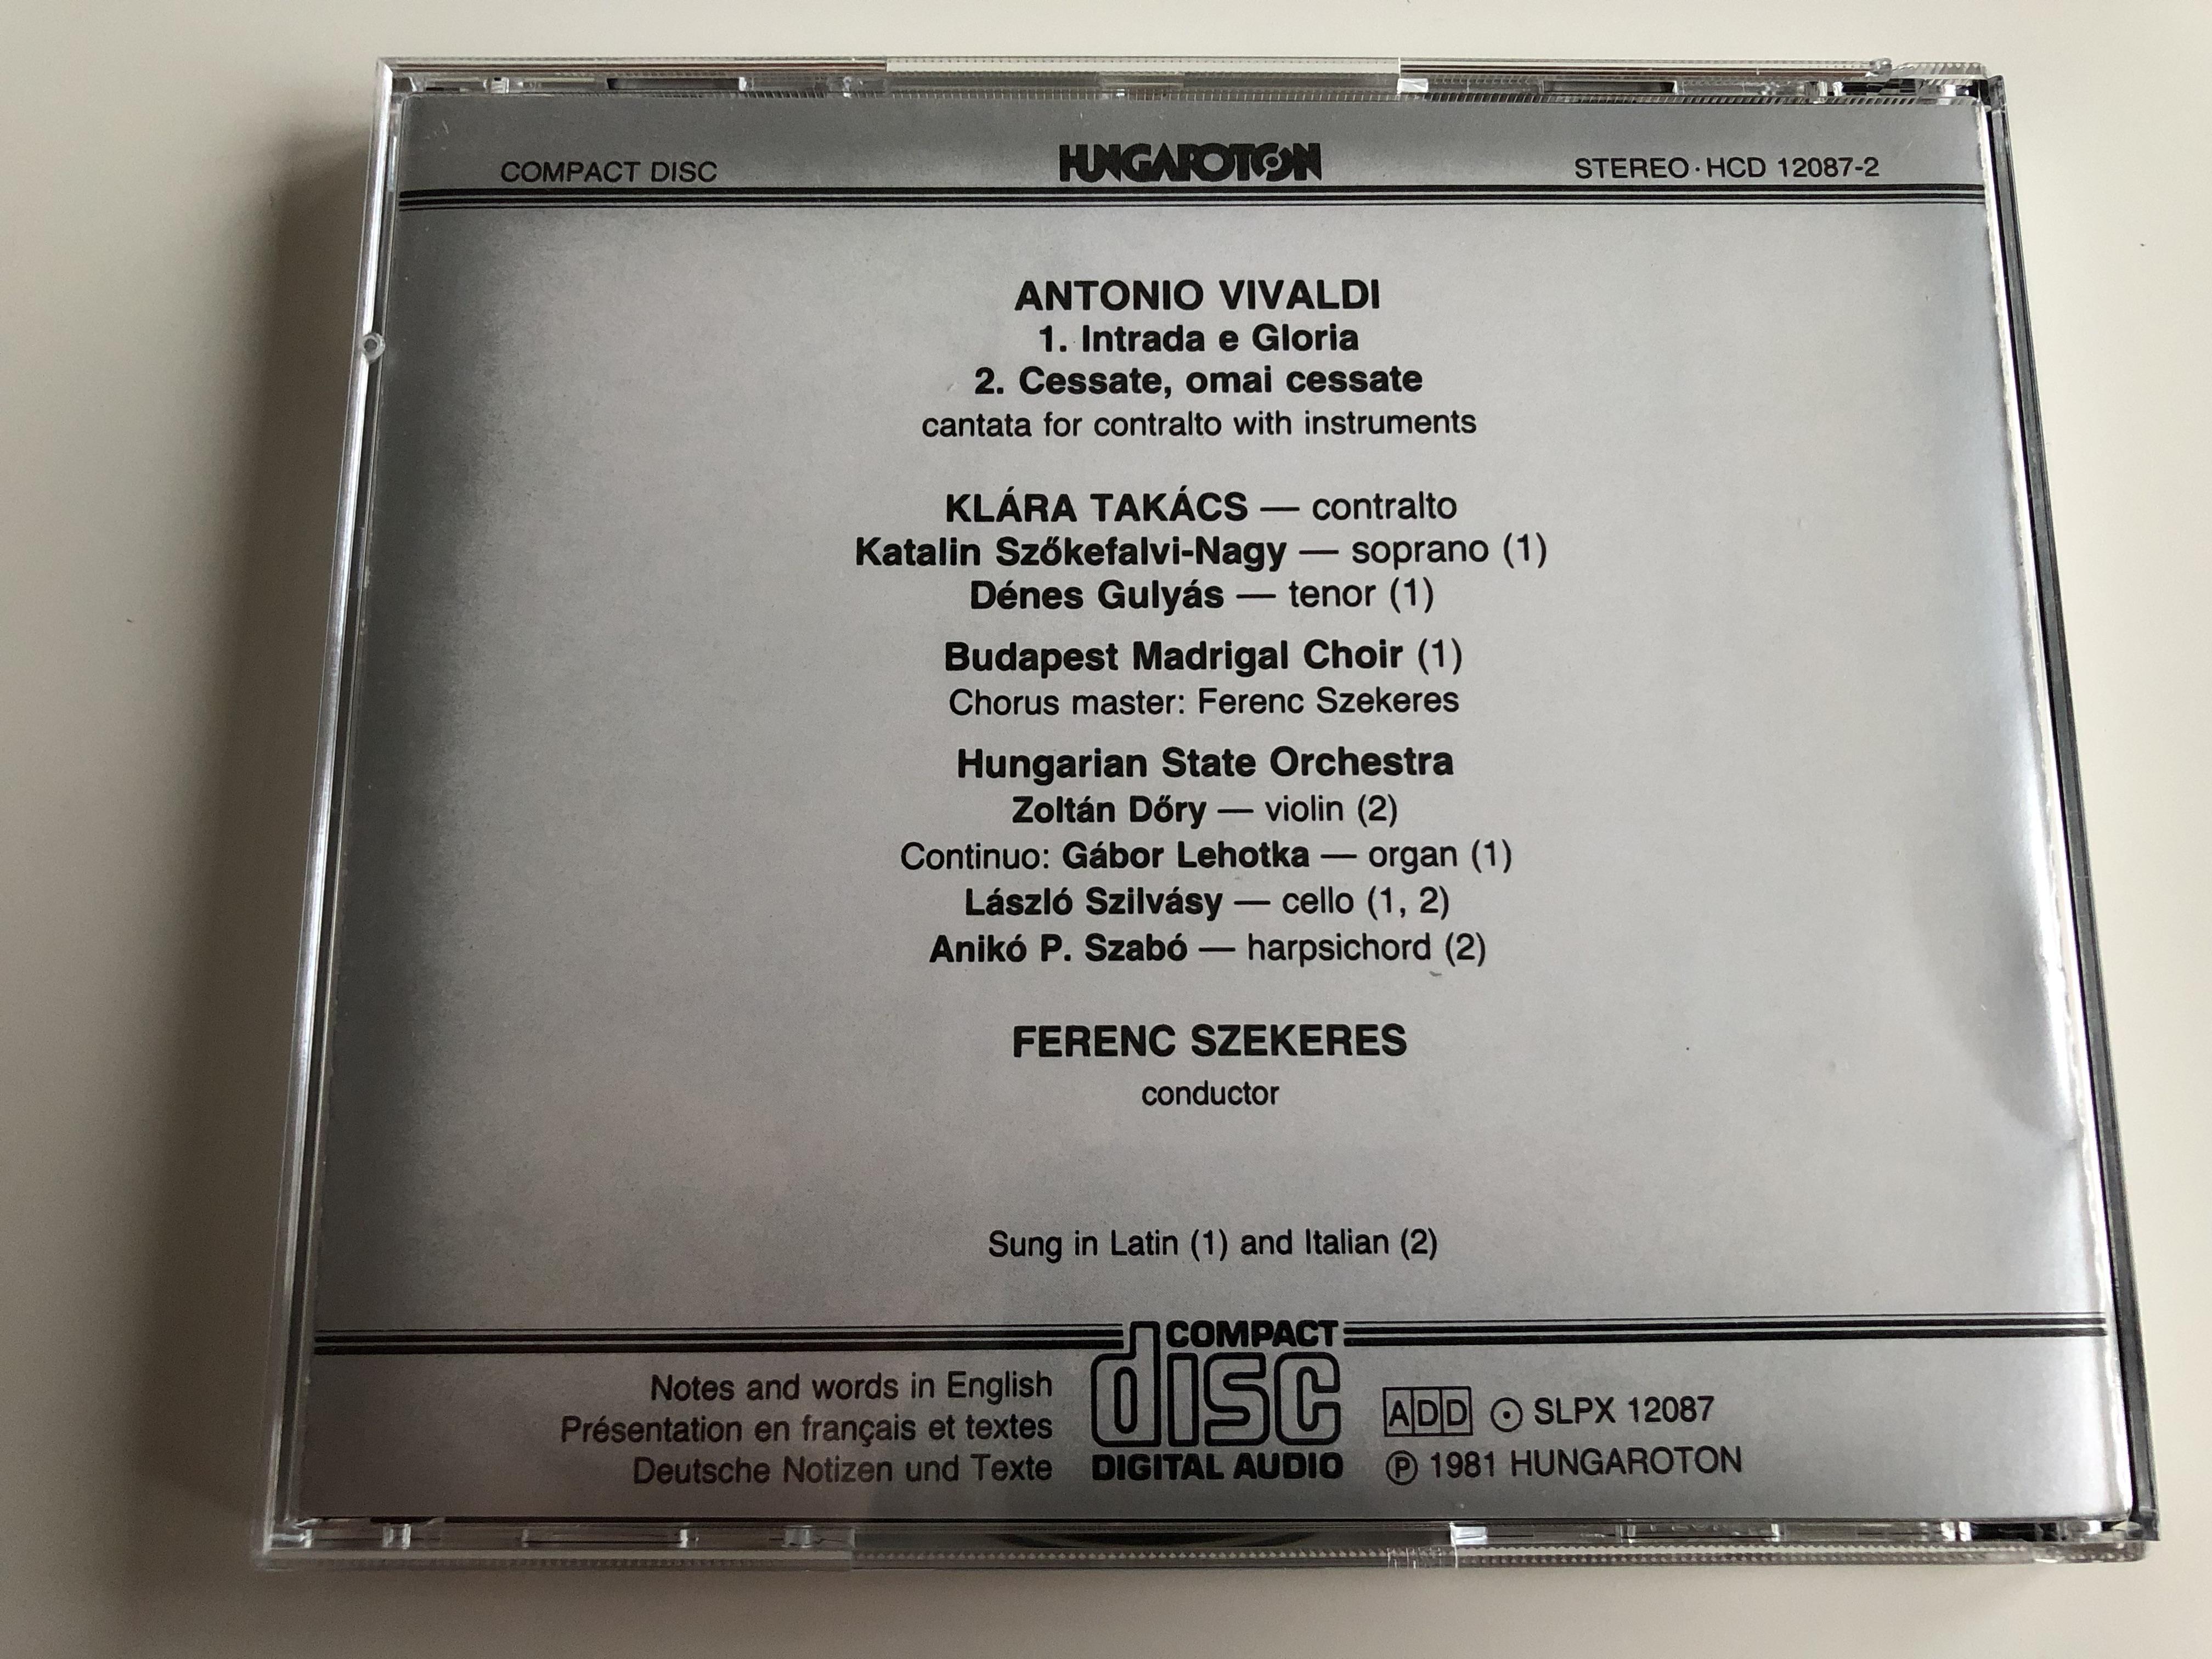 vivaldi-intrada-e-gloria-kl-ra-tak-cs-budapest-madrigal-choir-hungarian-state-orchestra-ferenc-szekeres-hungaroton-hcd-12087-2-11-.jpg